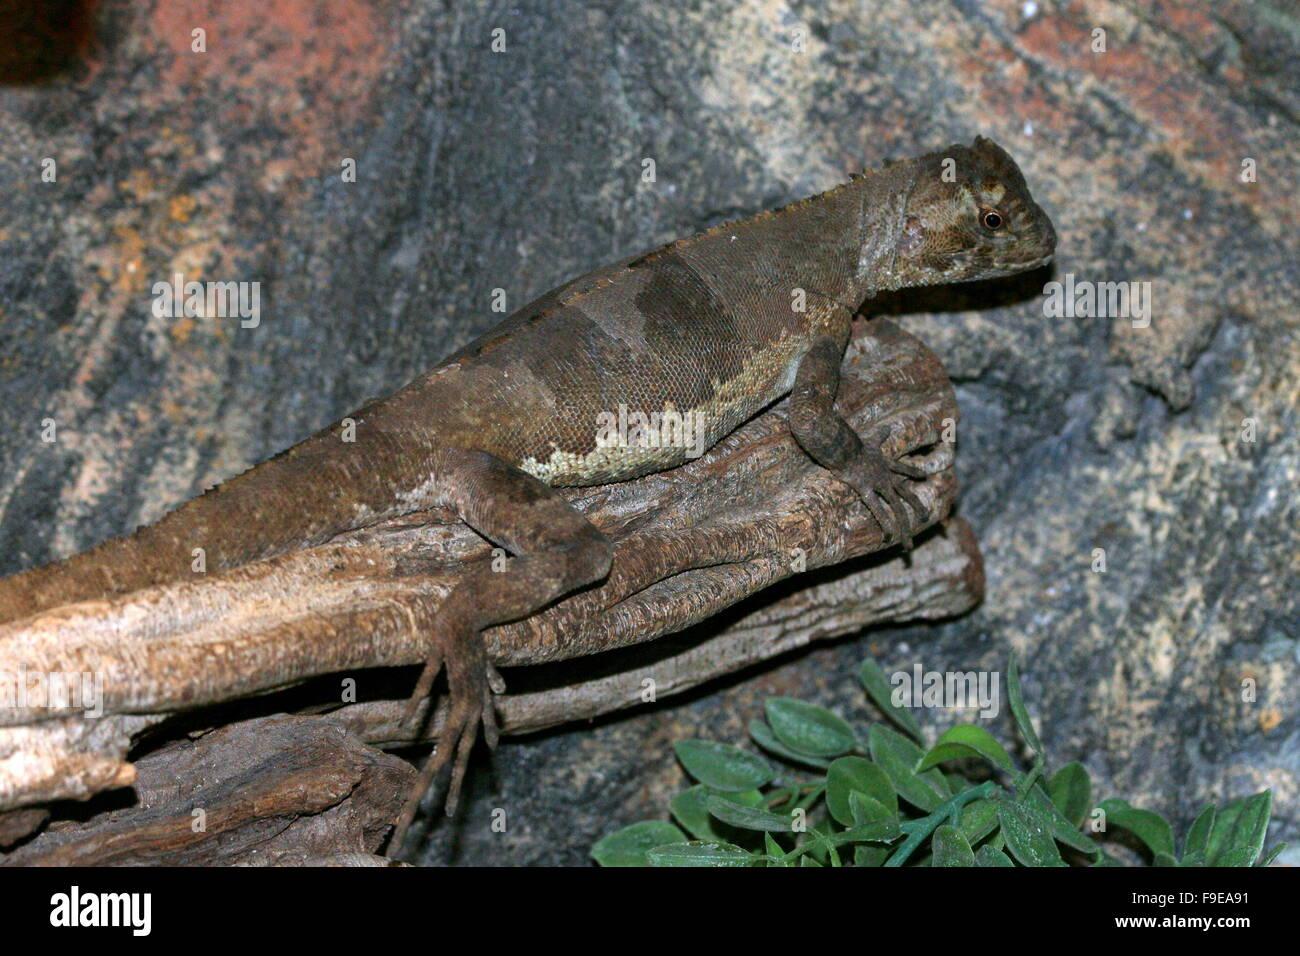 South American Mop headed Iguana (Uranoscodon superciliosus), aka Brazilian Diving Lizard, Brown Tree-climber or - Stock Image